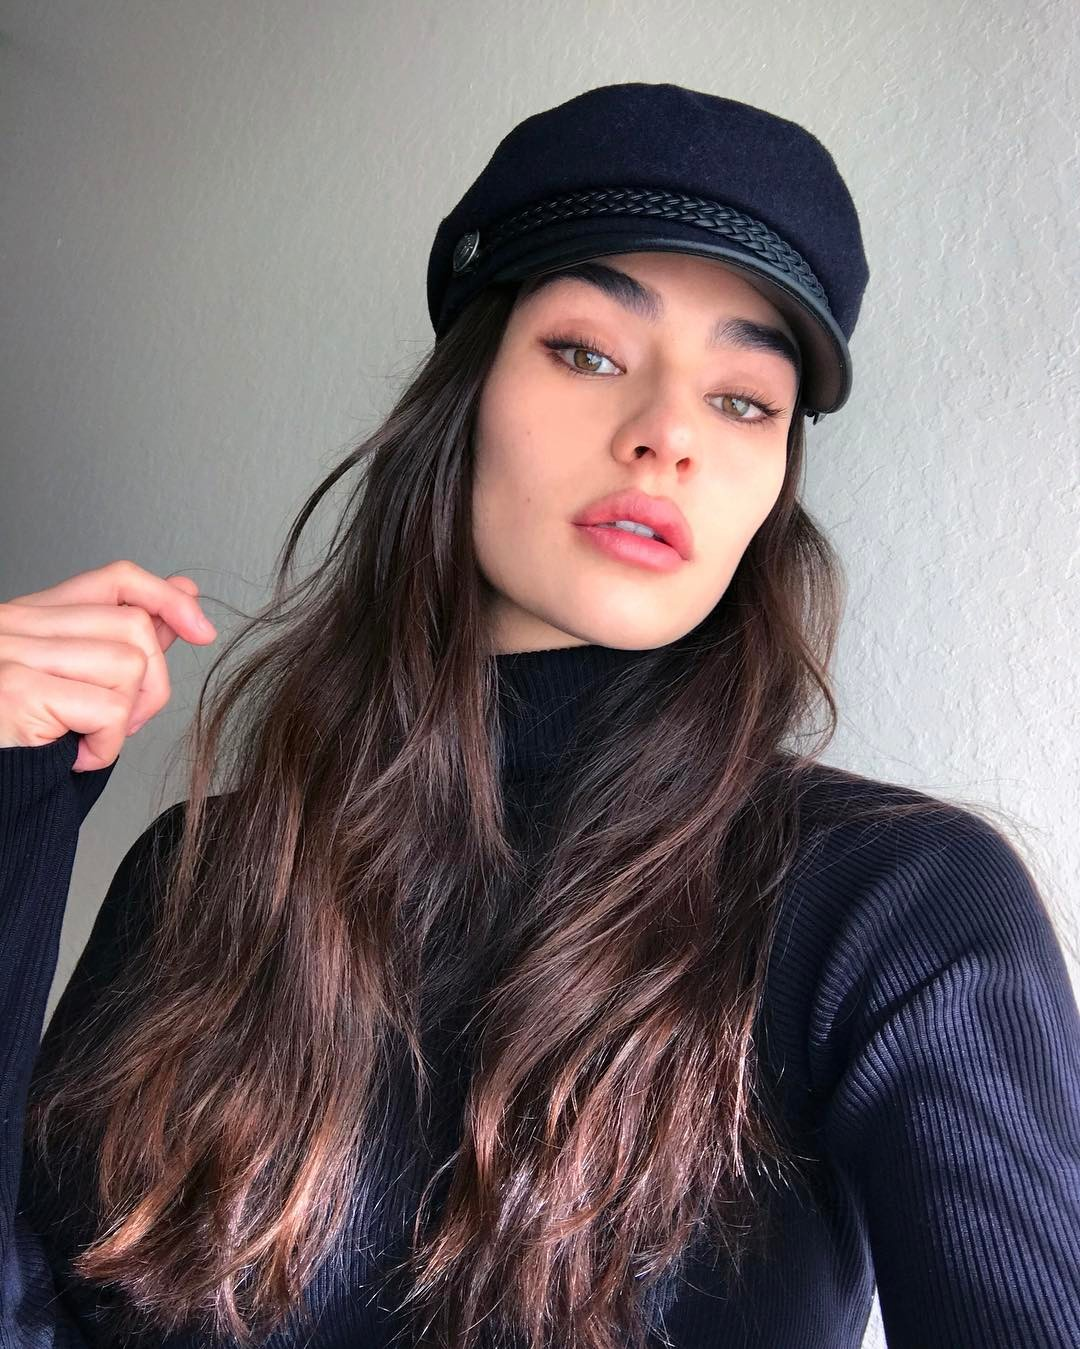 Kaitlyn-Fitzpatrick-Wallpapers-Insta-Fit-Bio-15